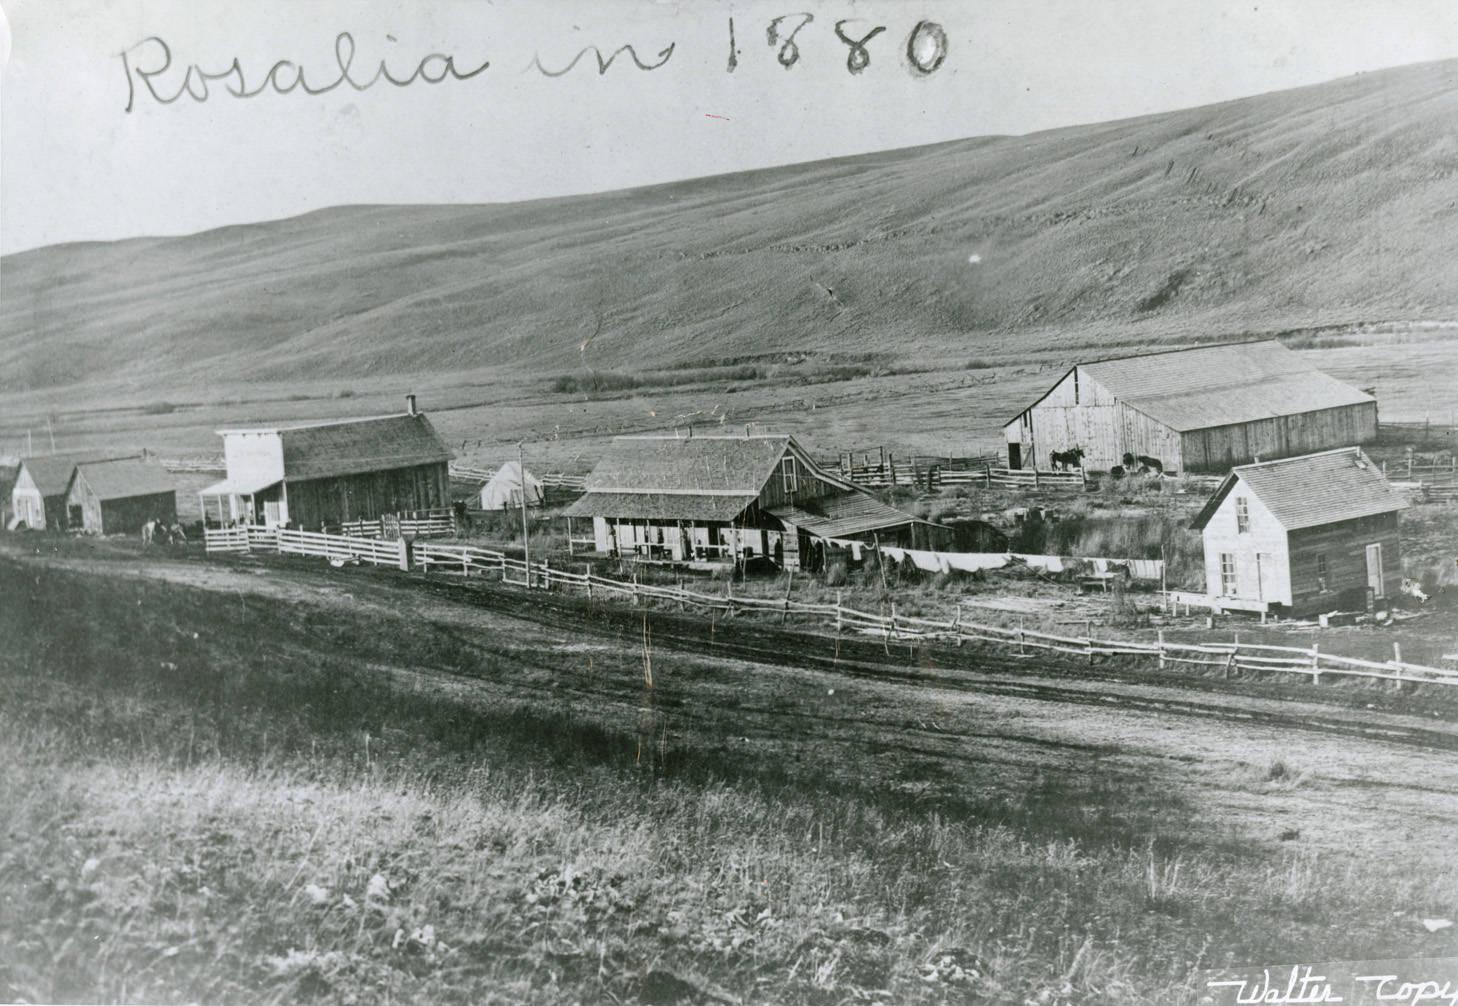 Rosalia_Washington_1880